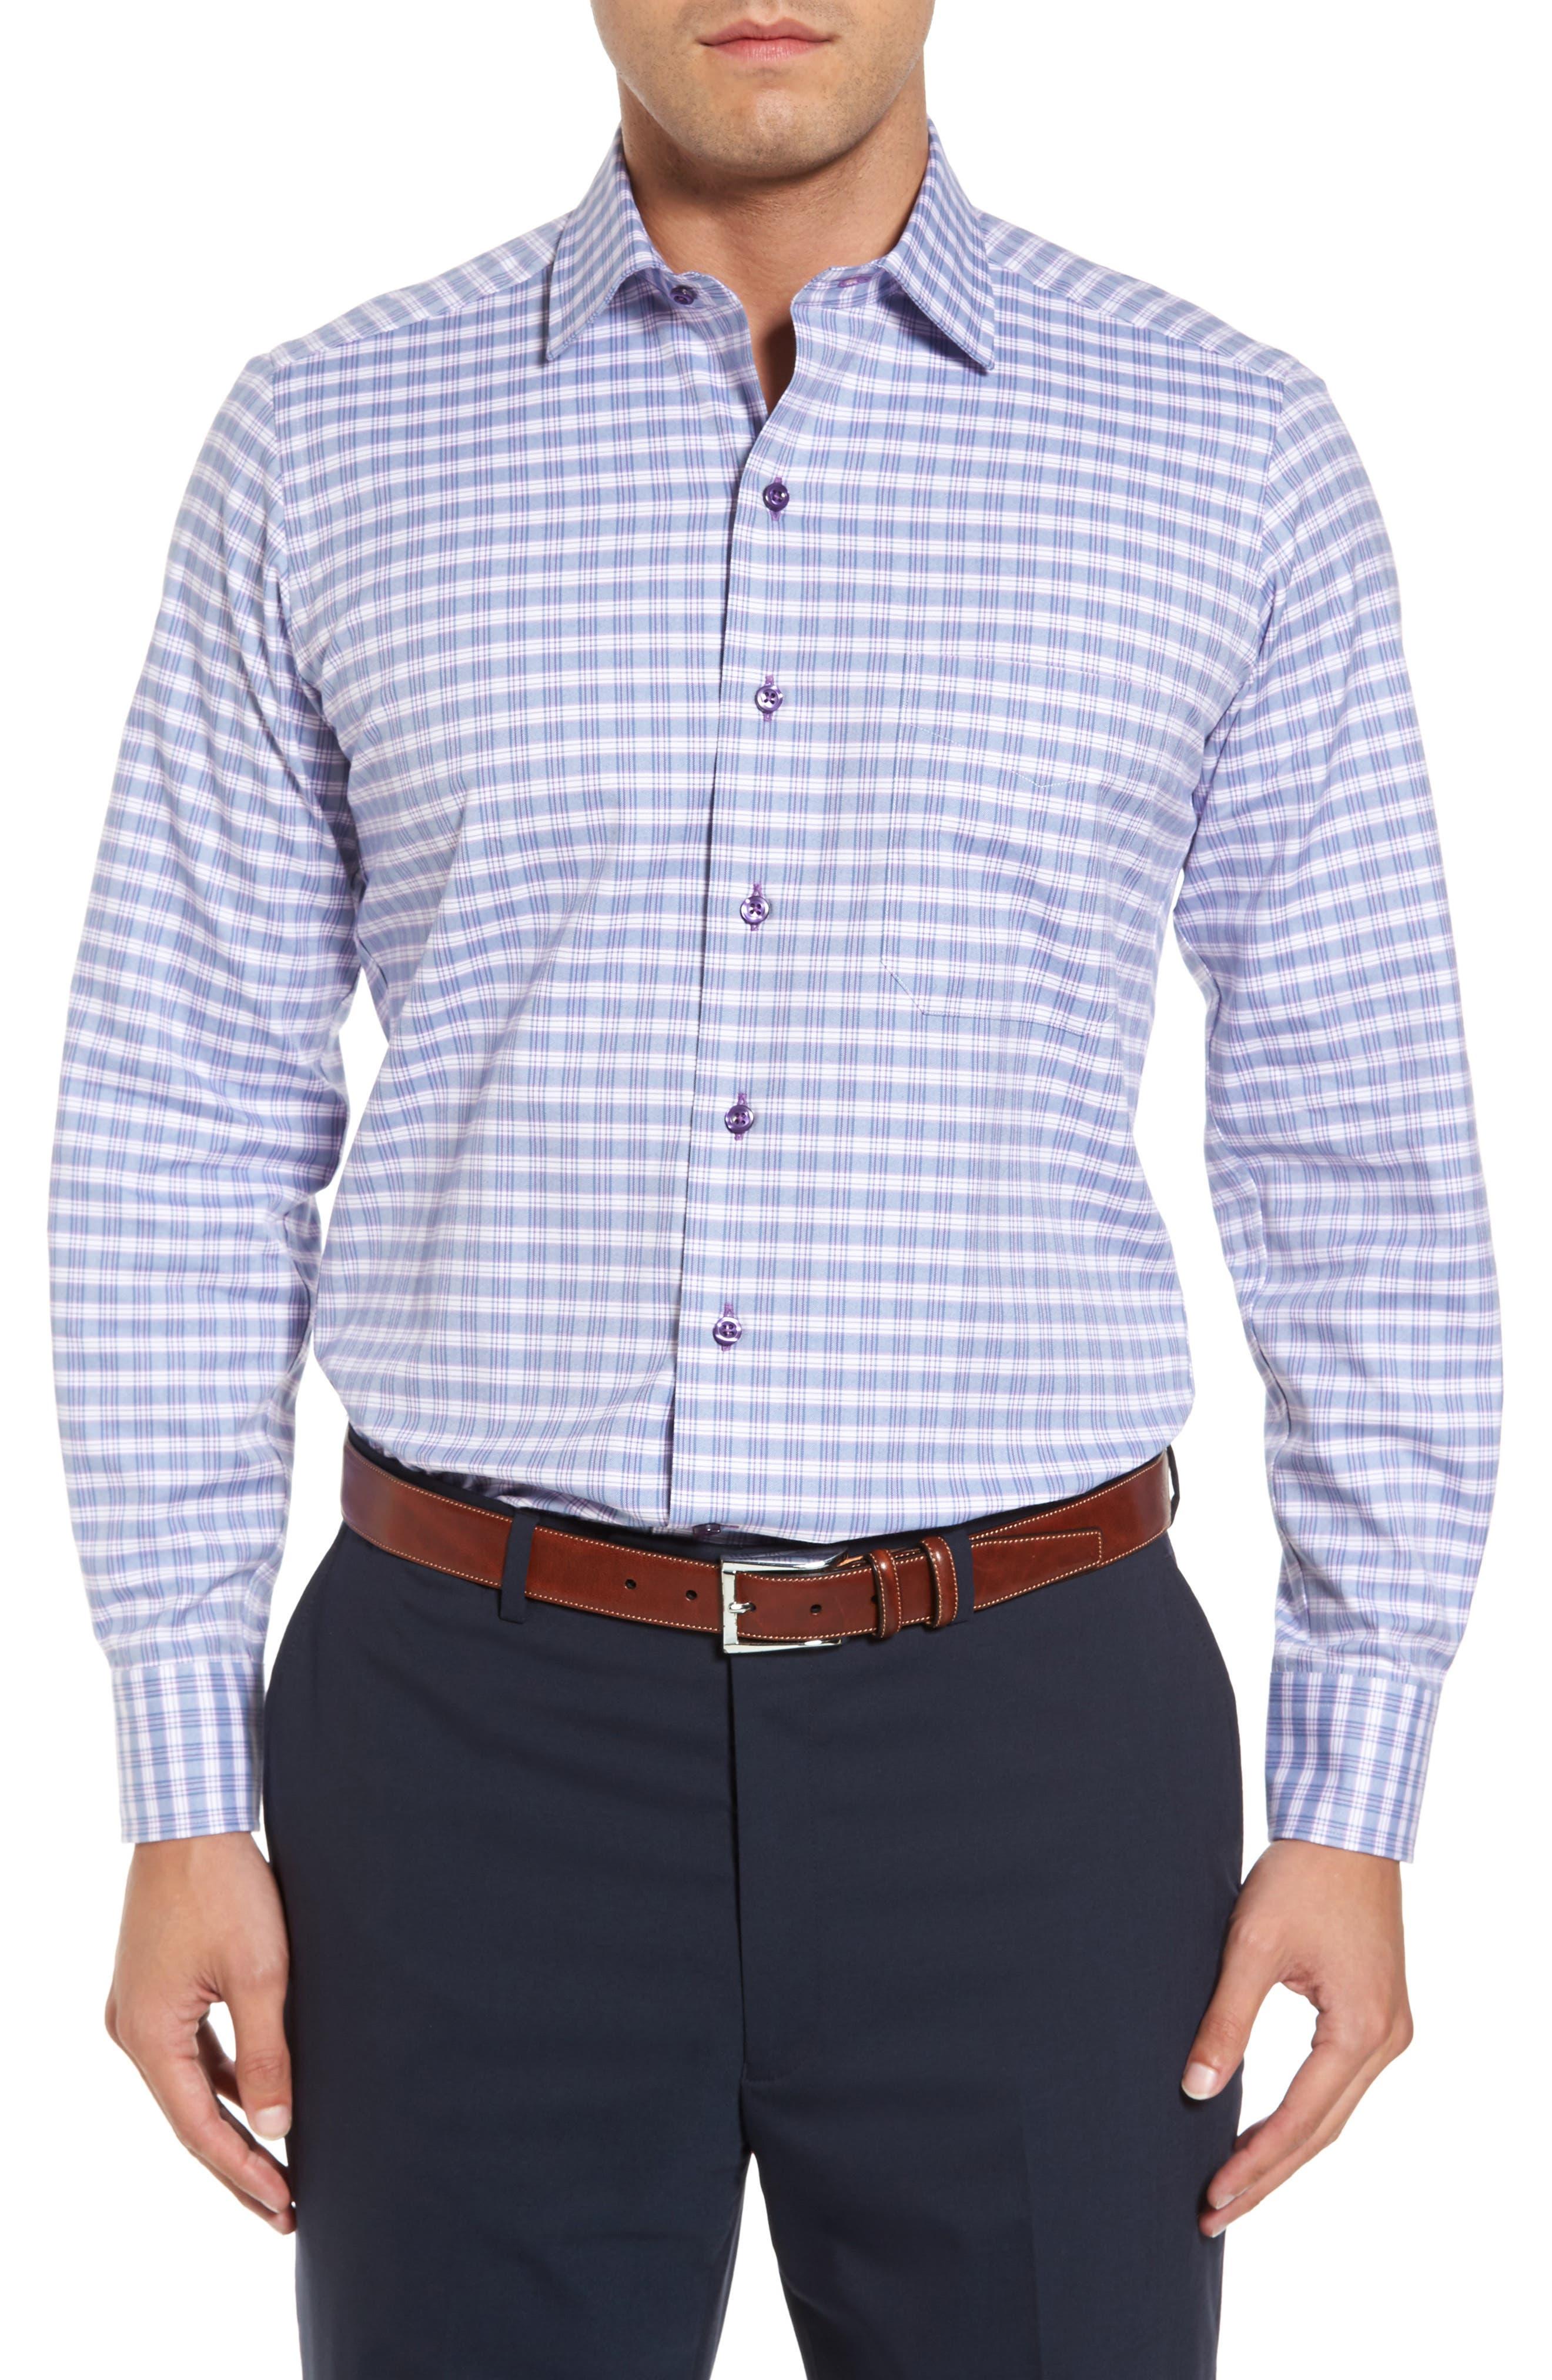 Alternate Image 1 Selected - David Donahue Check Regular Fit Sport Shirt